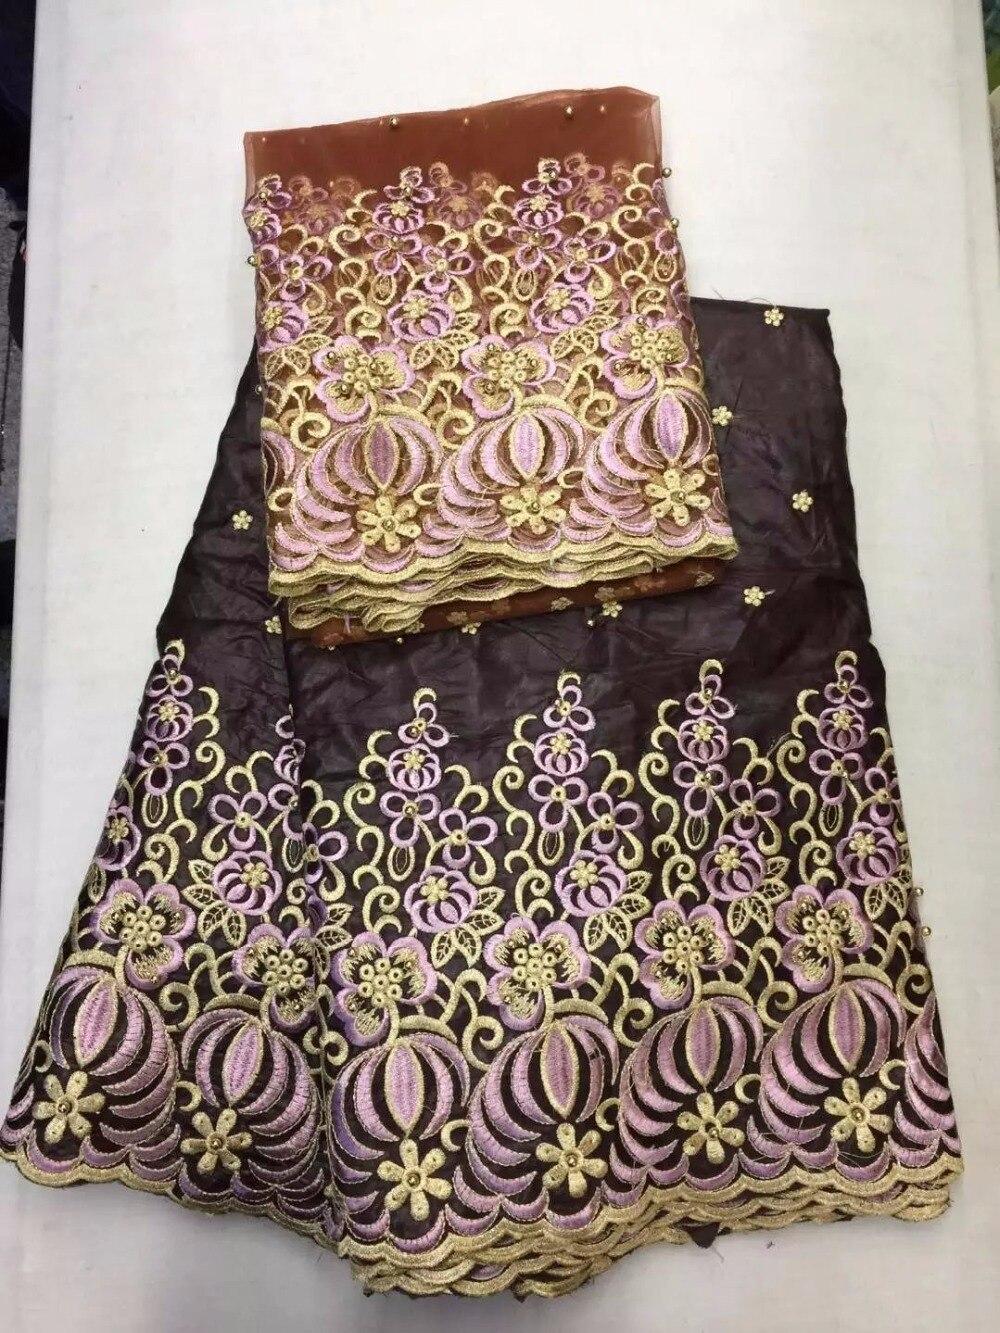 Shirt design in nigeria - 5 Yards Africa Bazin Nouveau Riche Embroidery Yarn Lace Fabric 2 Yards Shirt Nigeria Bazin Fl1992